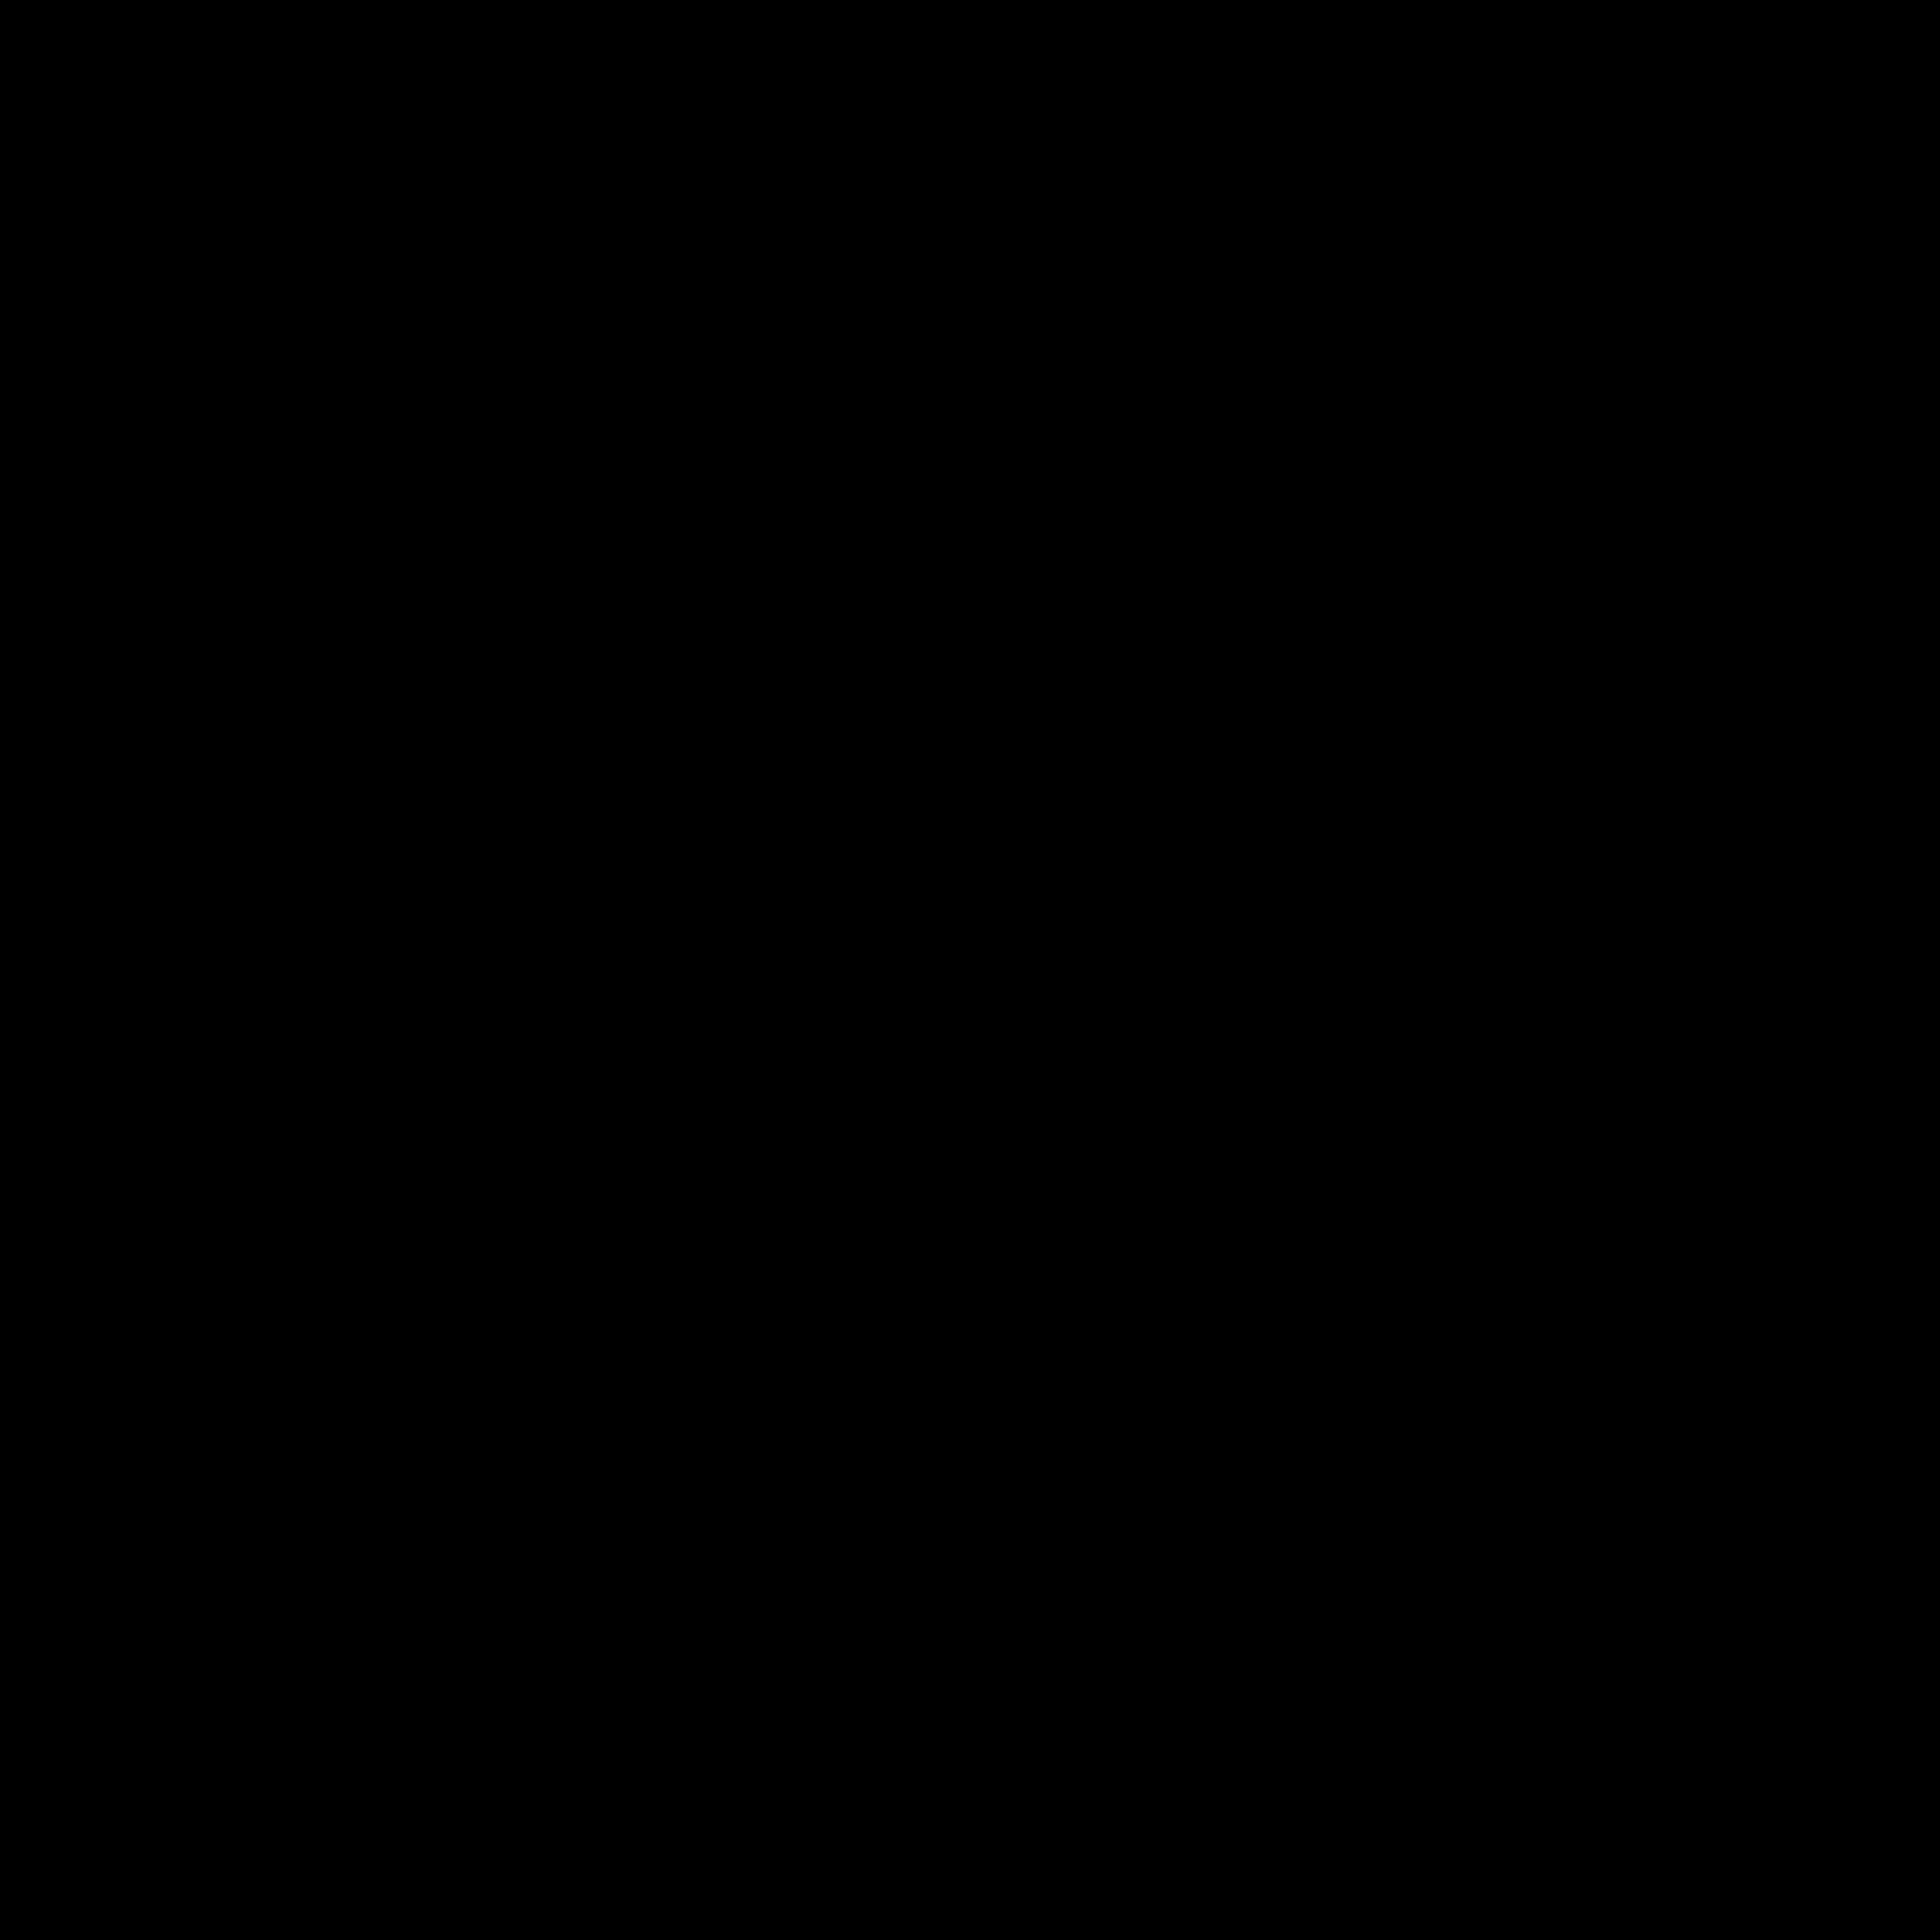 Harp Vector File image